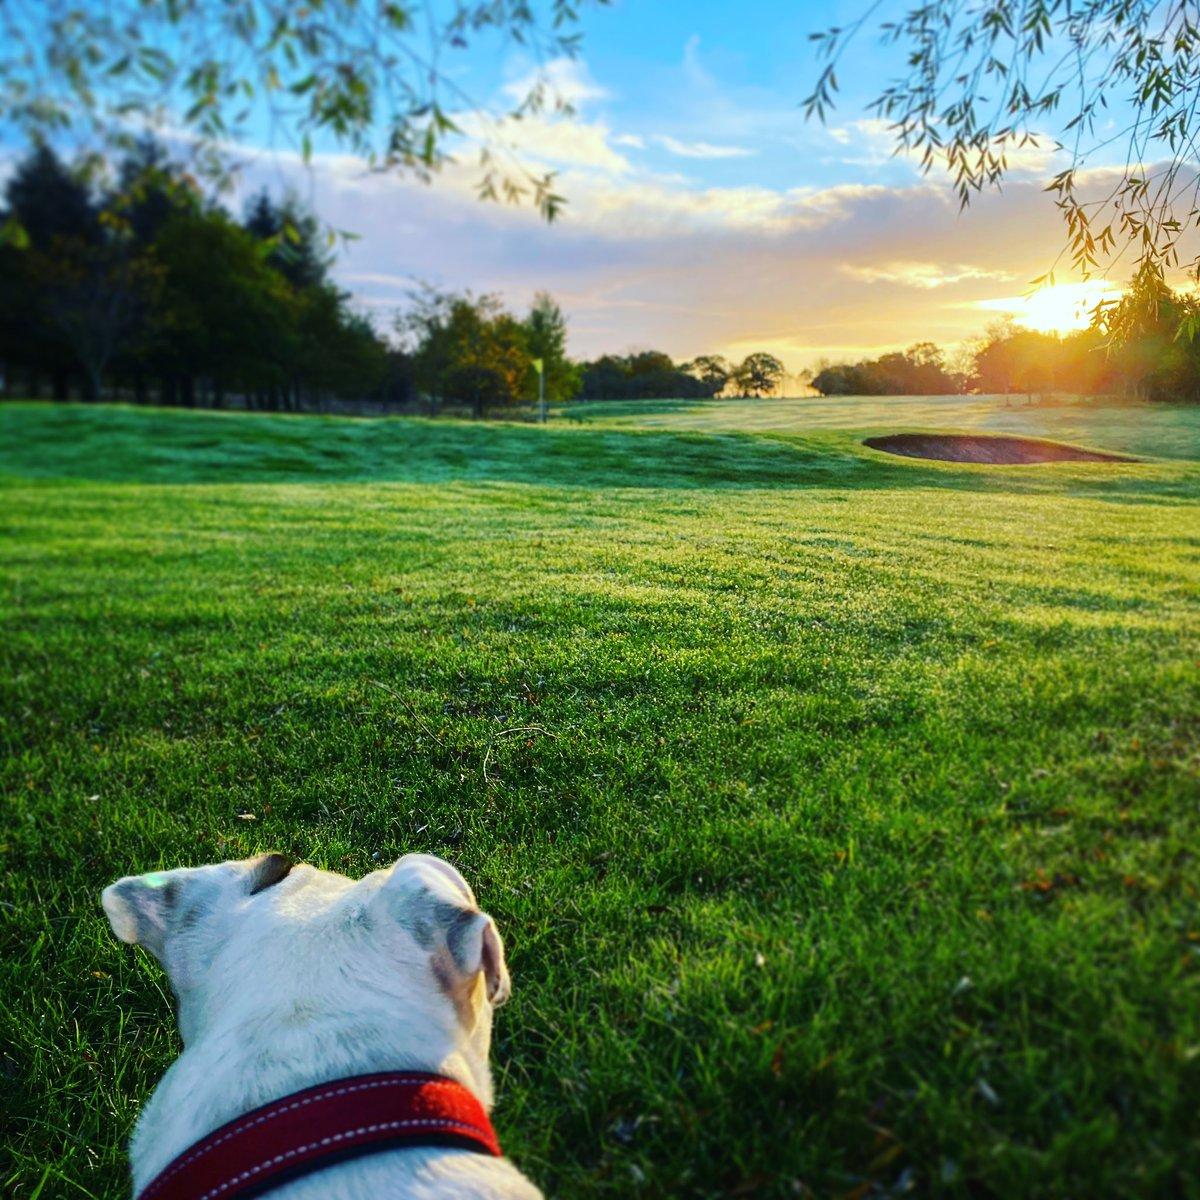 It's a dogs life #doggo #dogslife #sunrise #walkies #walks #morning @KatyRickittITV @LewisHamilton https://t.co/pbfxyC3JDj